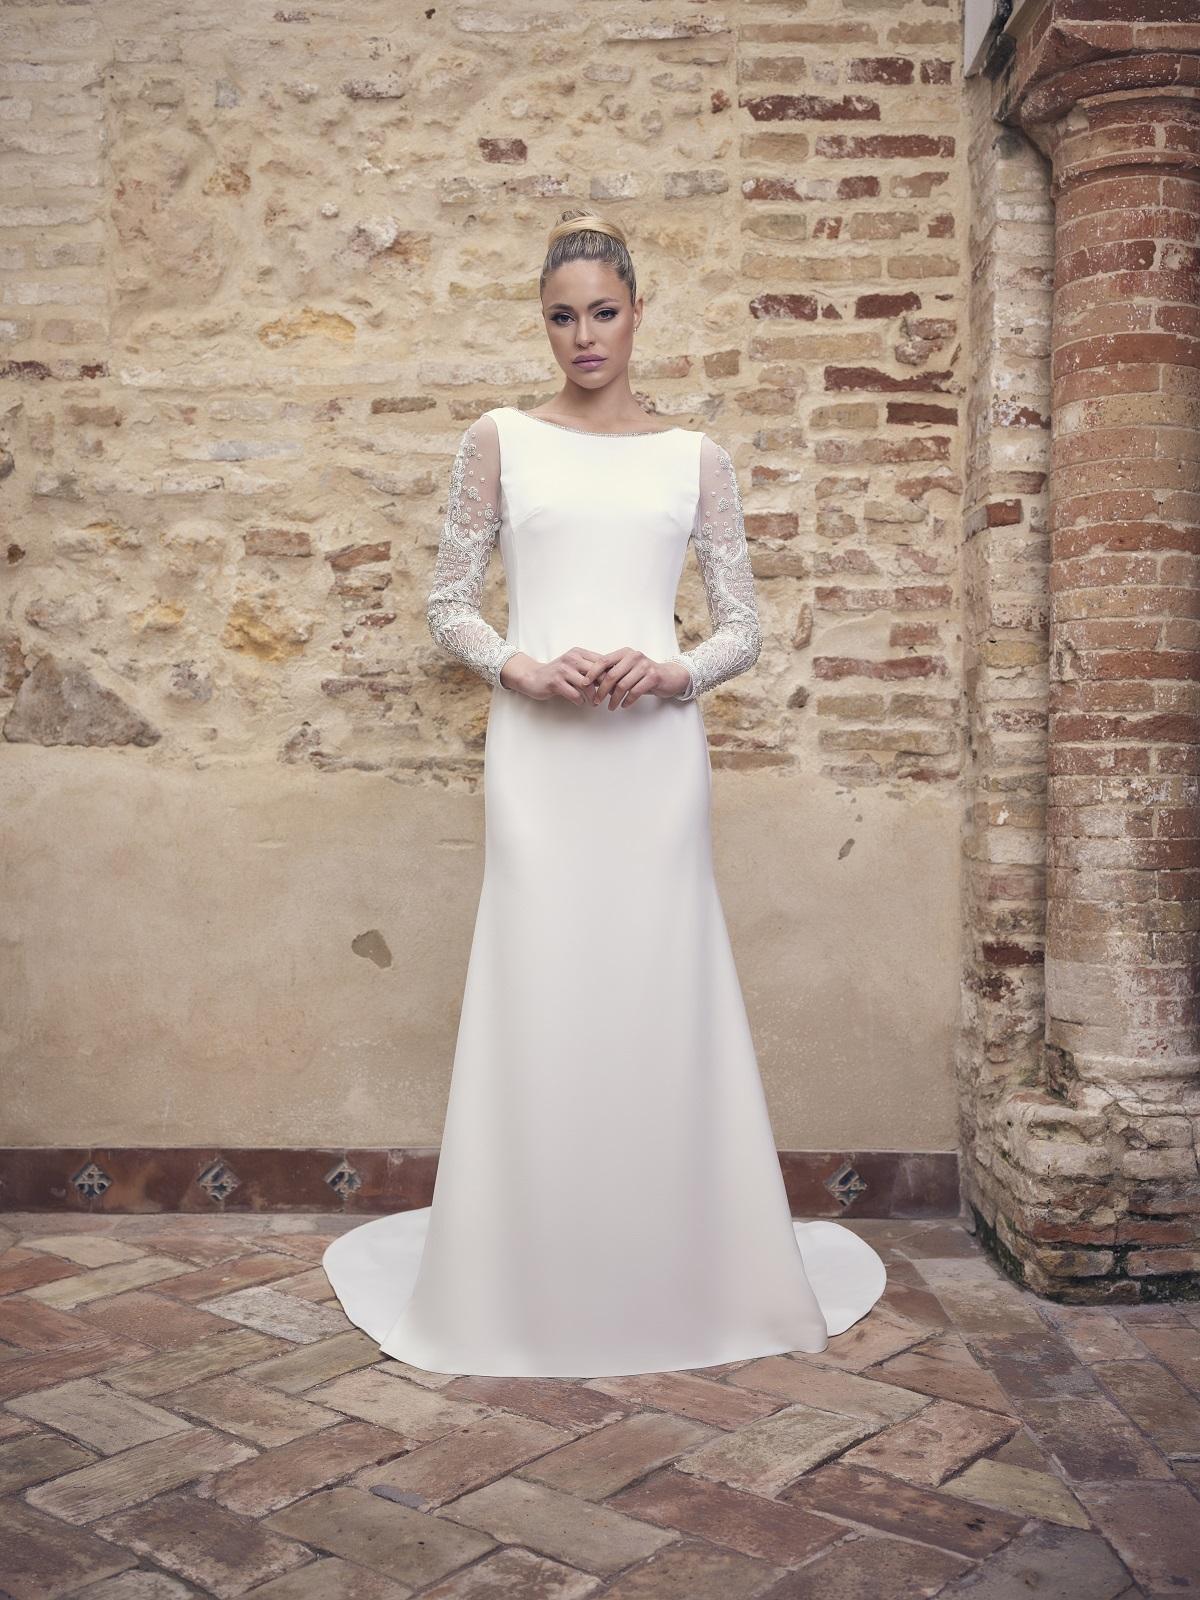 Vestido de novia sencillo con mangas de encaje